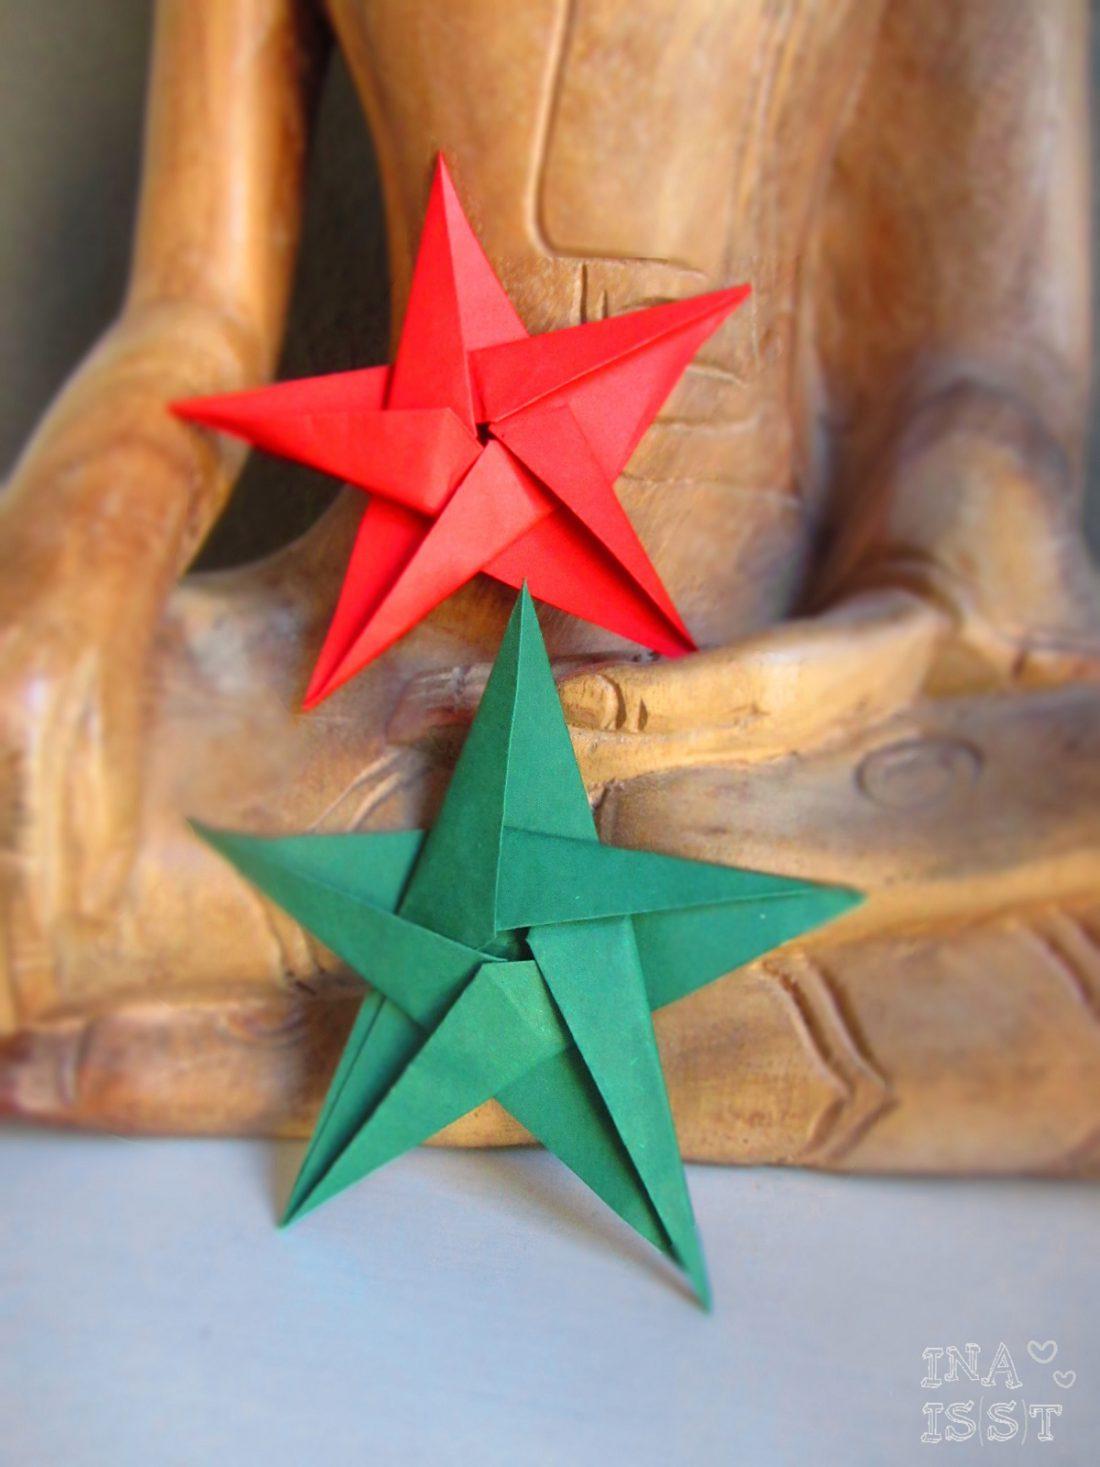 Berühmt DIY Sterne falten #3 - Ina Isst PY91